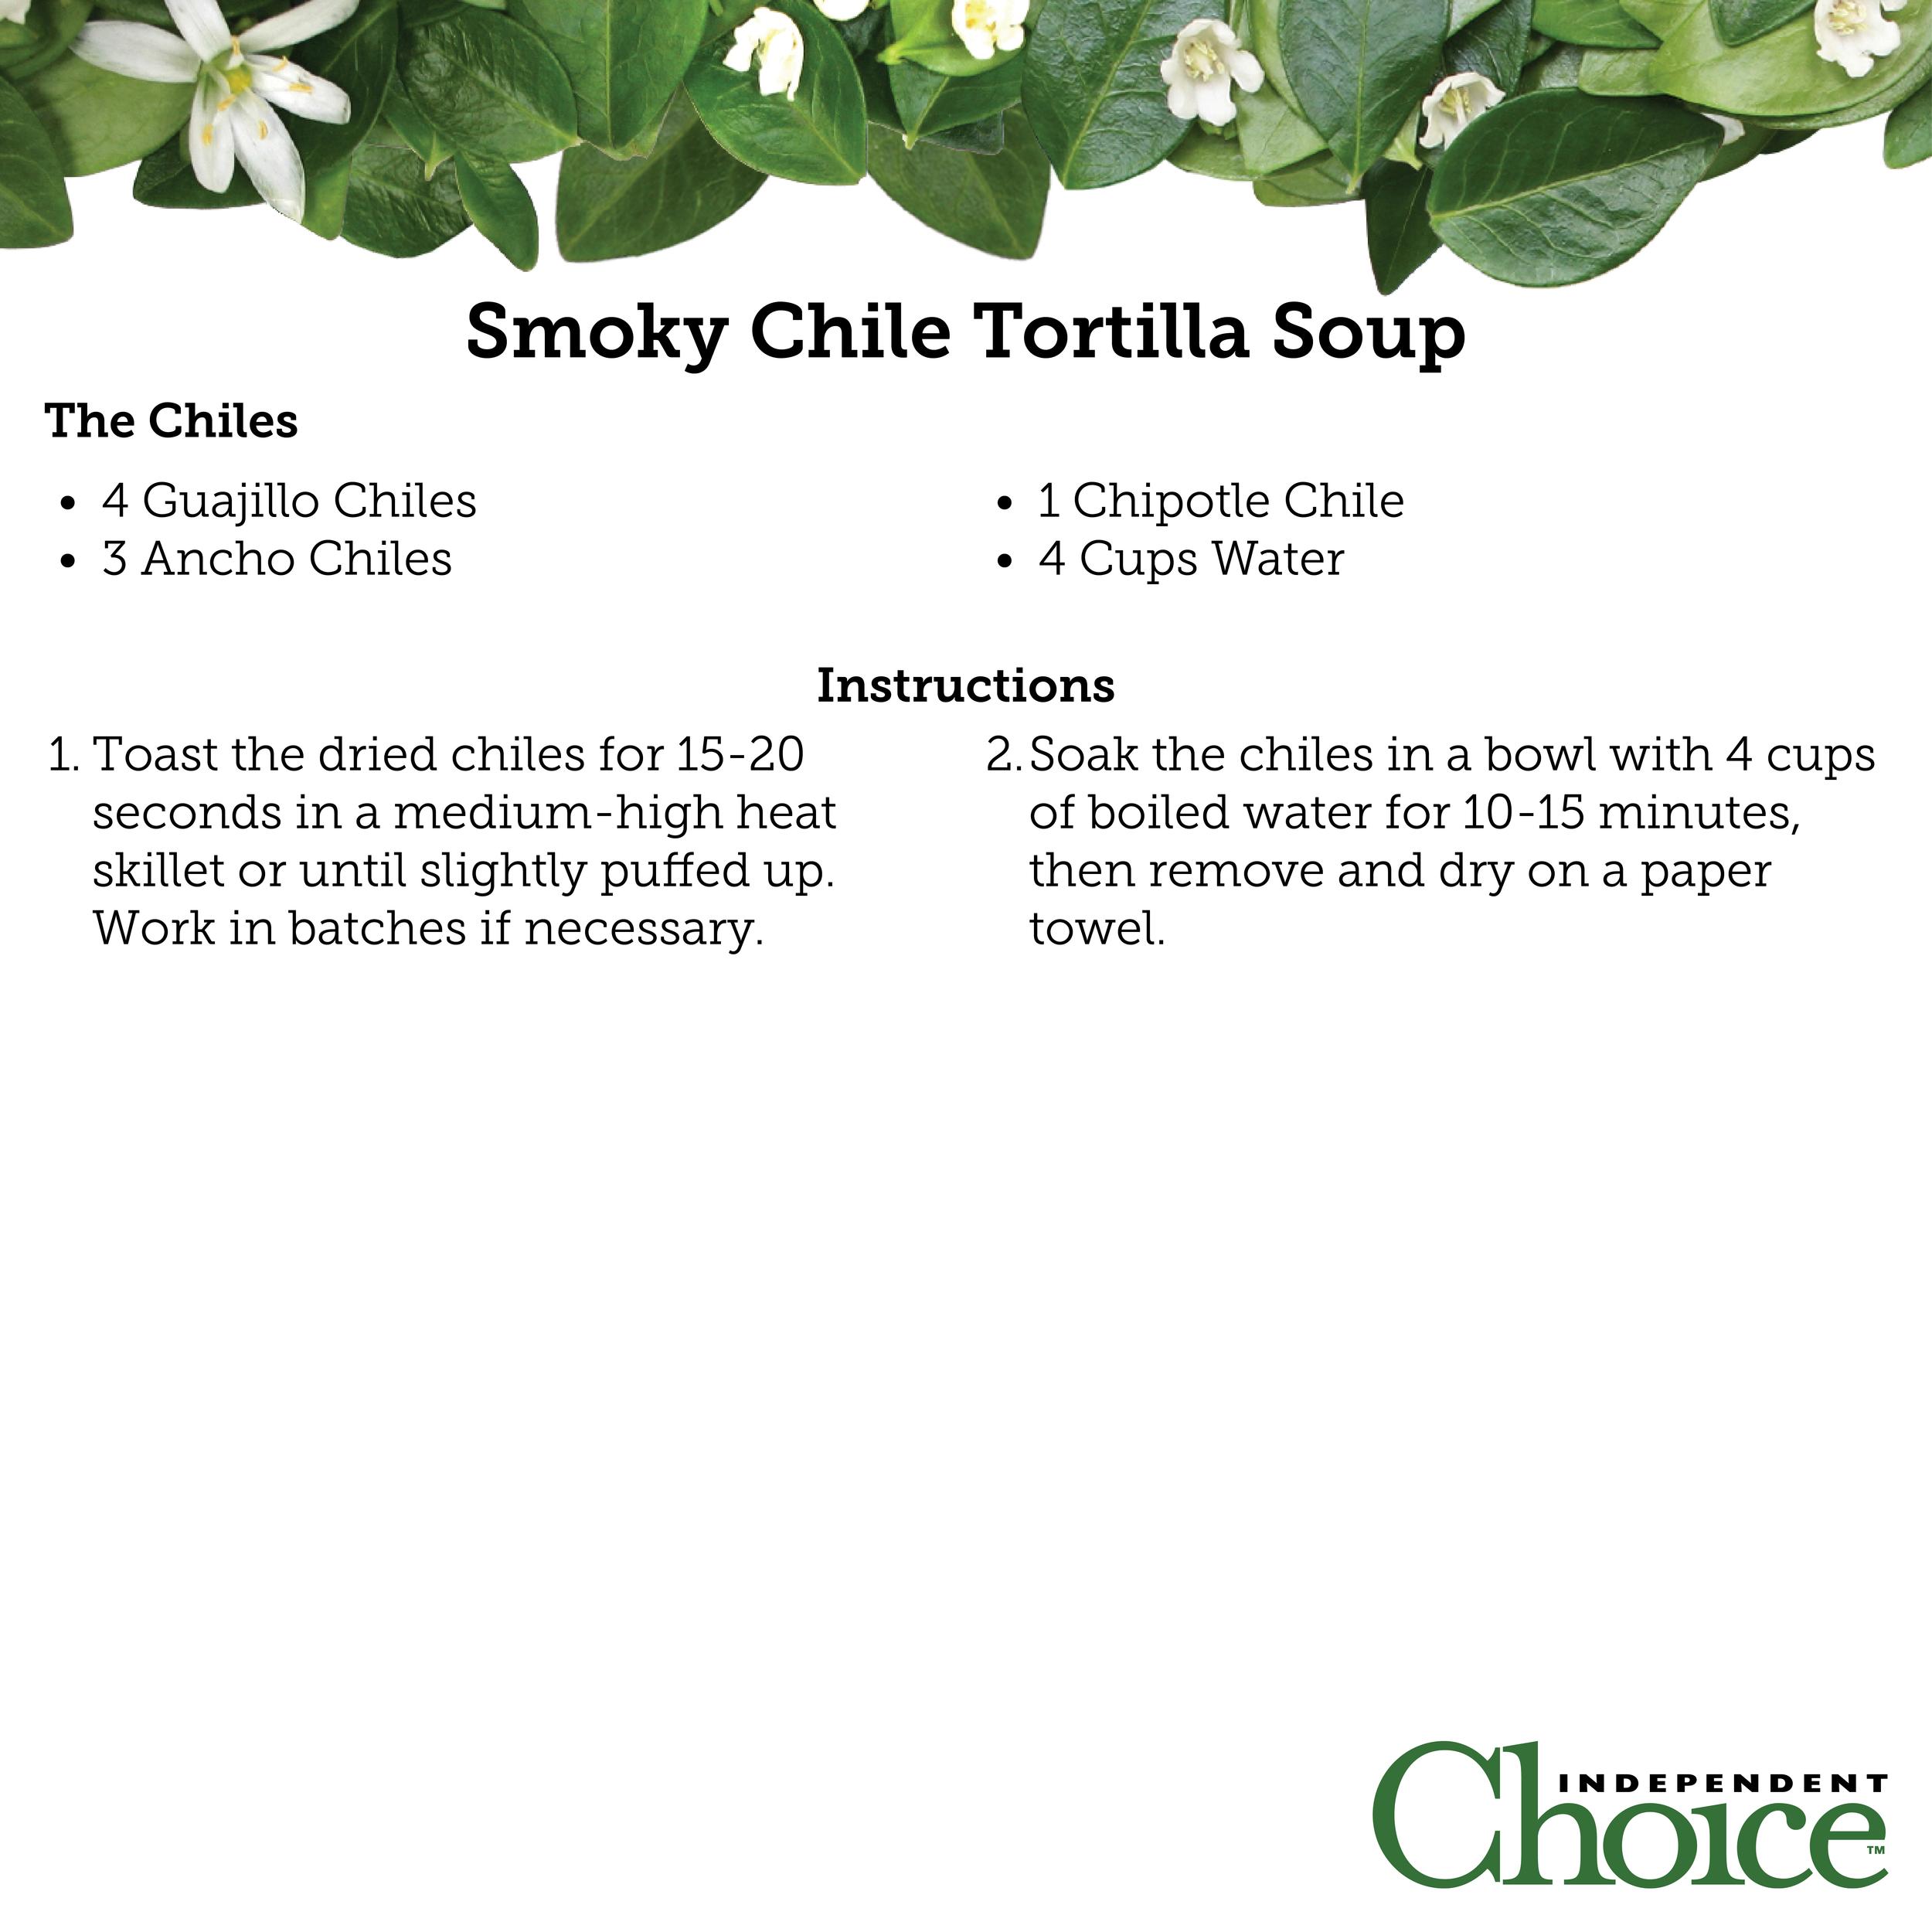 Smoky Chile Tortilla Soup 1.png